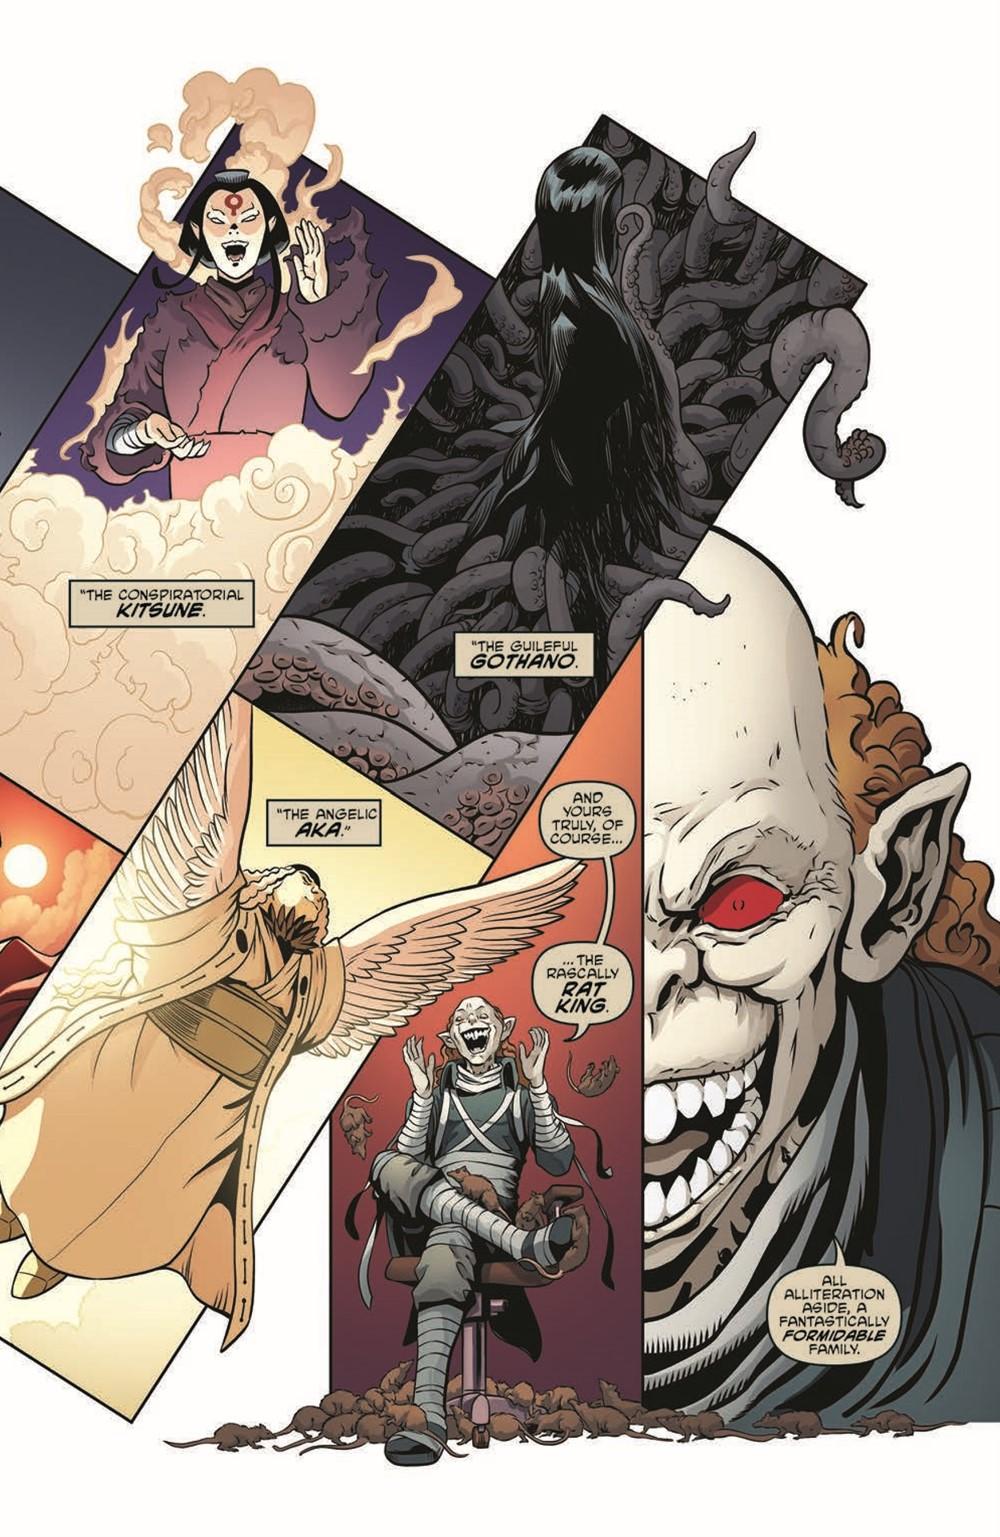 TMNT-Annual2021_pr-5 ComicList Previews: TEENAGE MUTANT NINJA TURTLES ANNUAL 2021